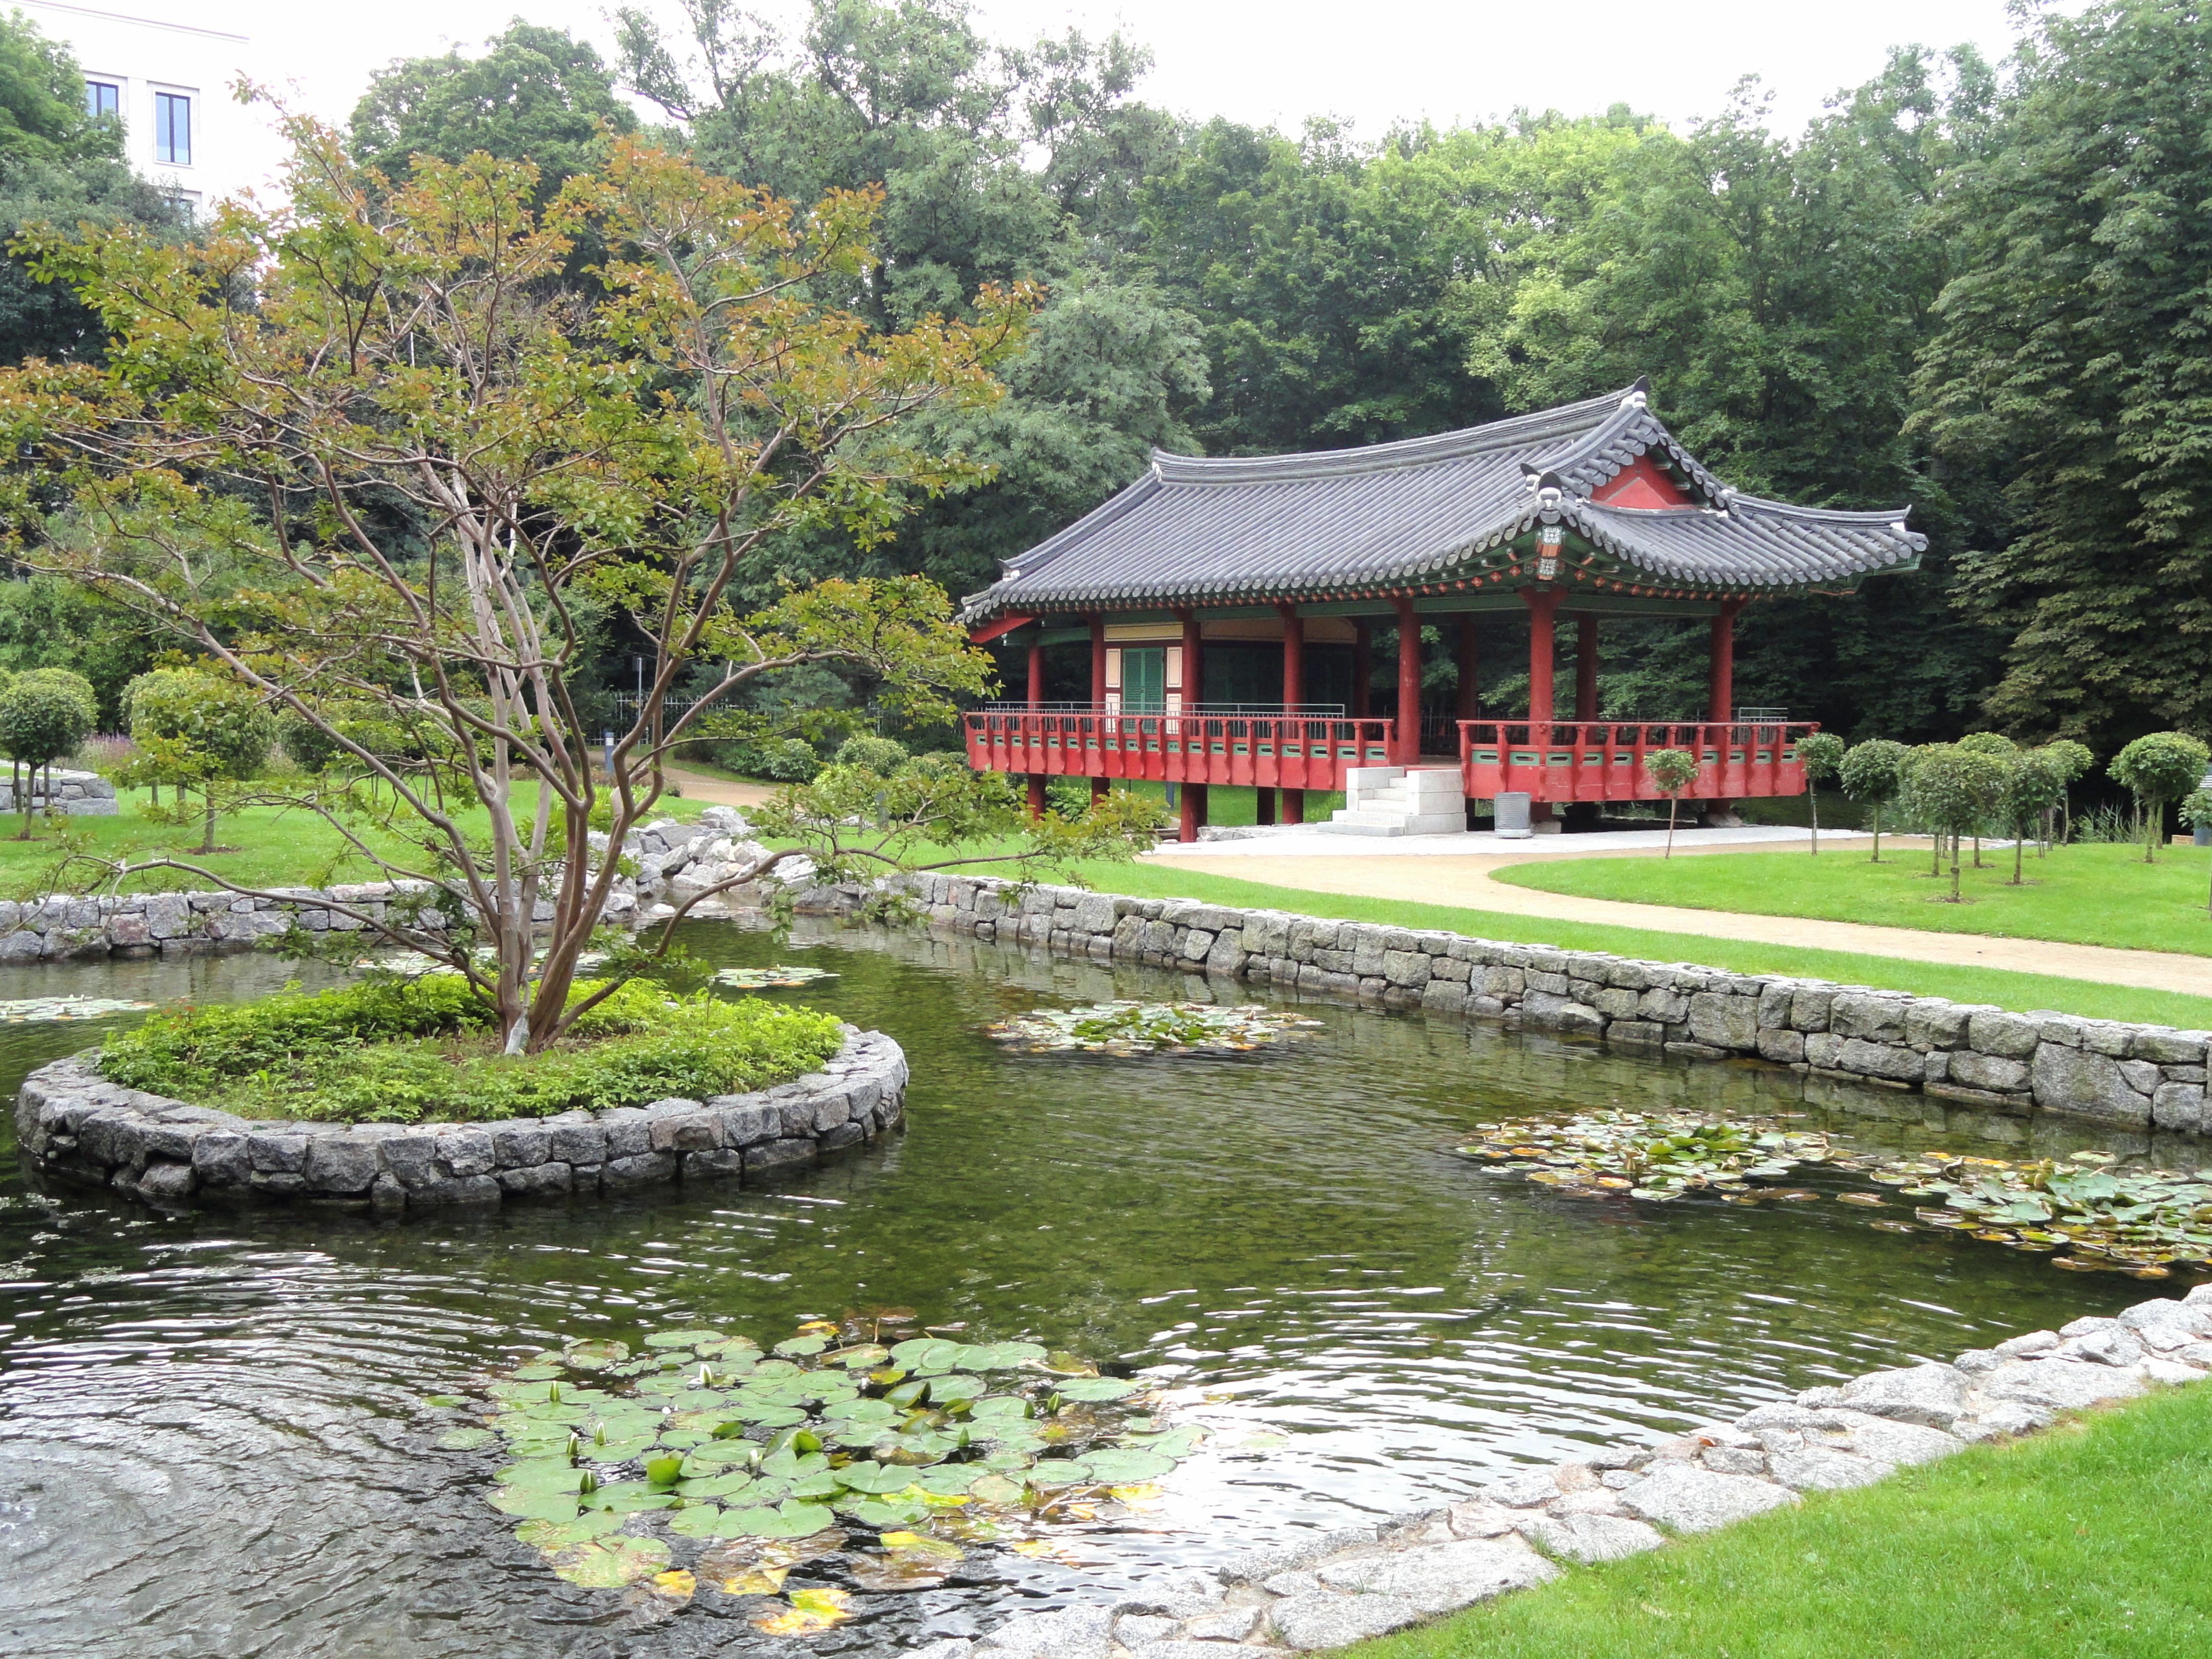 Korean Landscape Garden : File koreanischer garten gr?neburgpark dsc g wikimedia